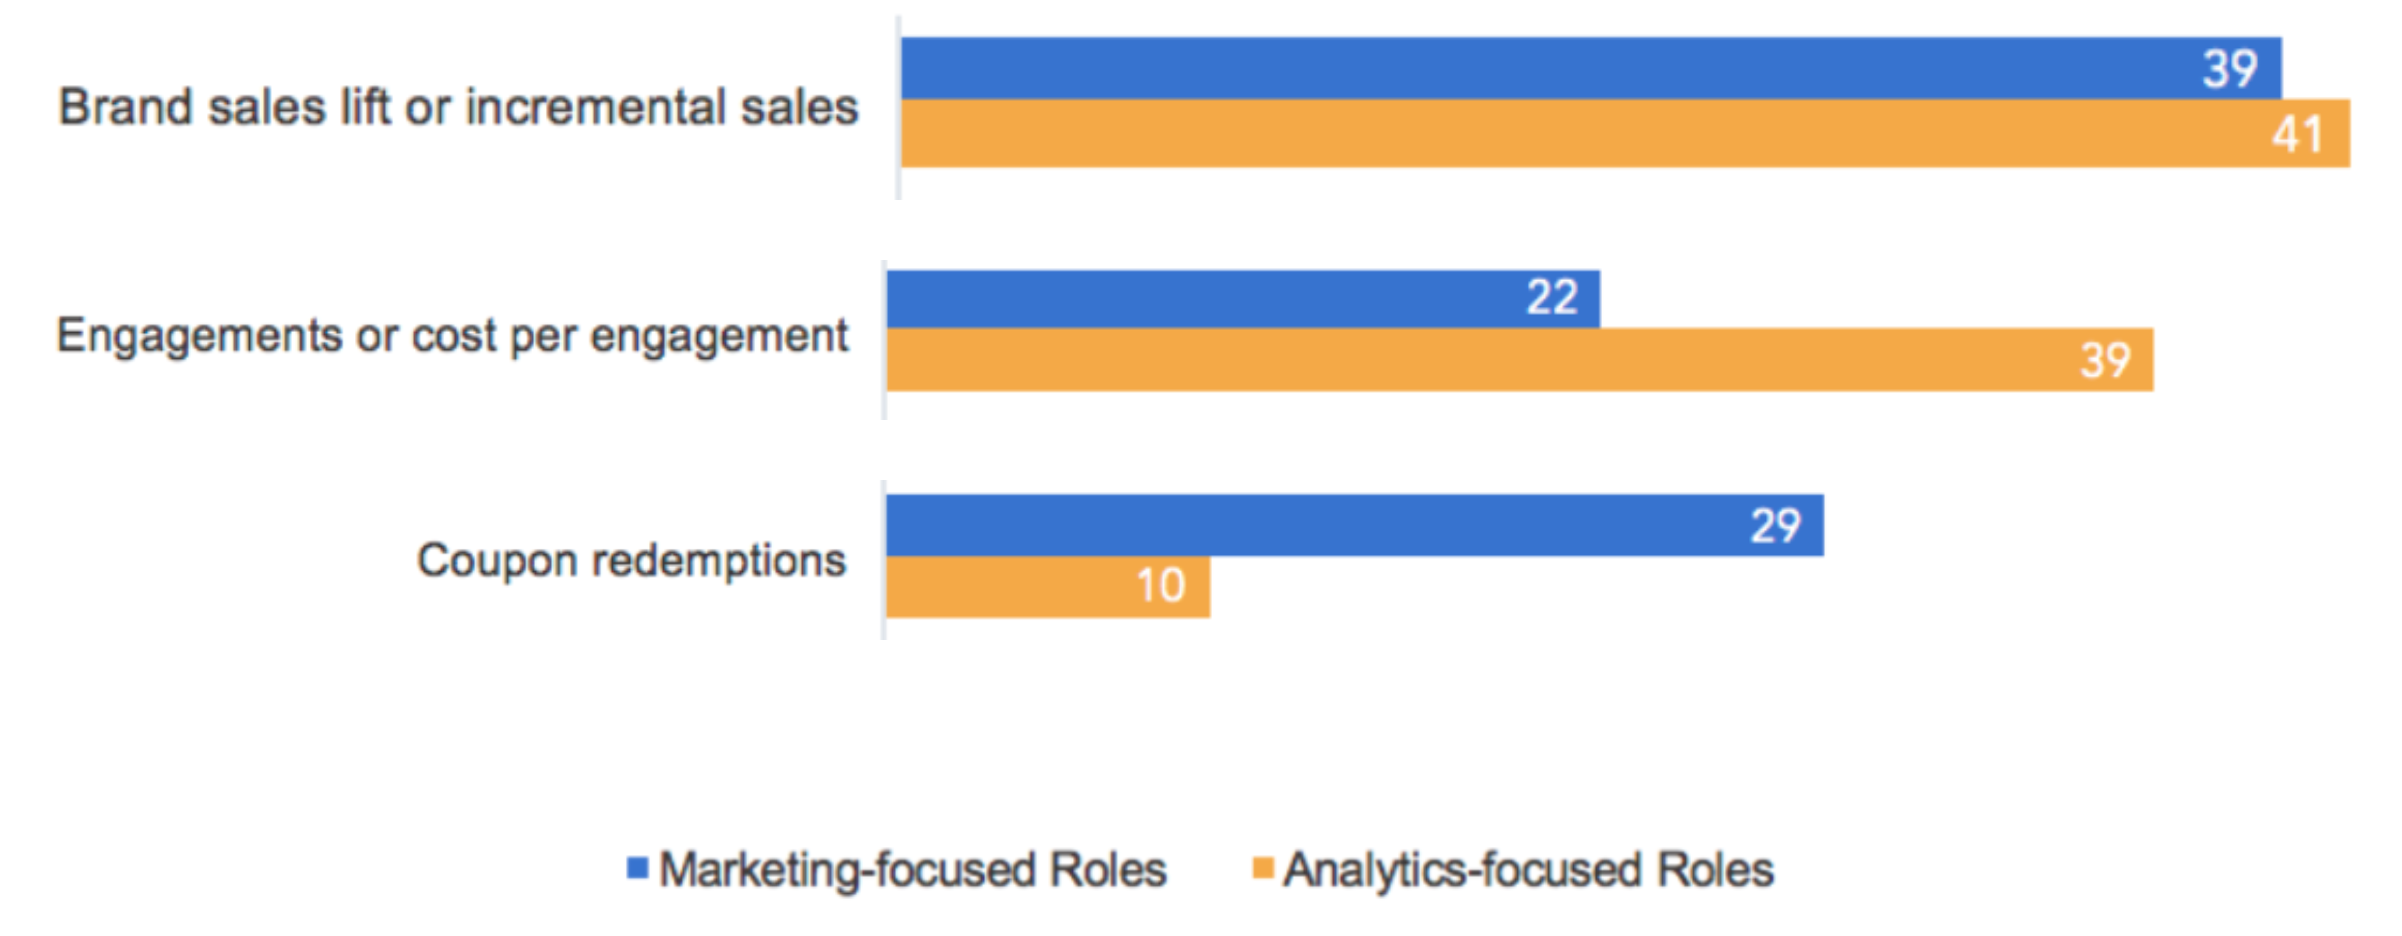 Analytics Survey Highlight 2a